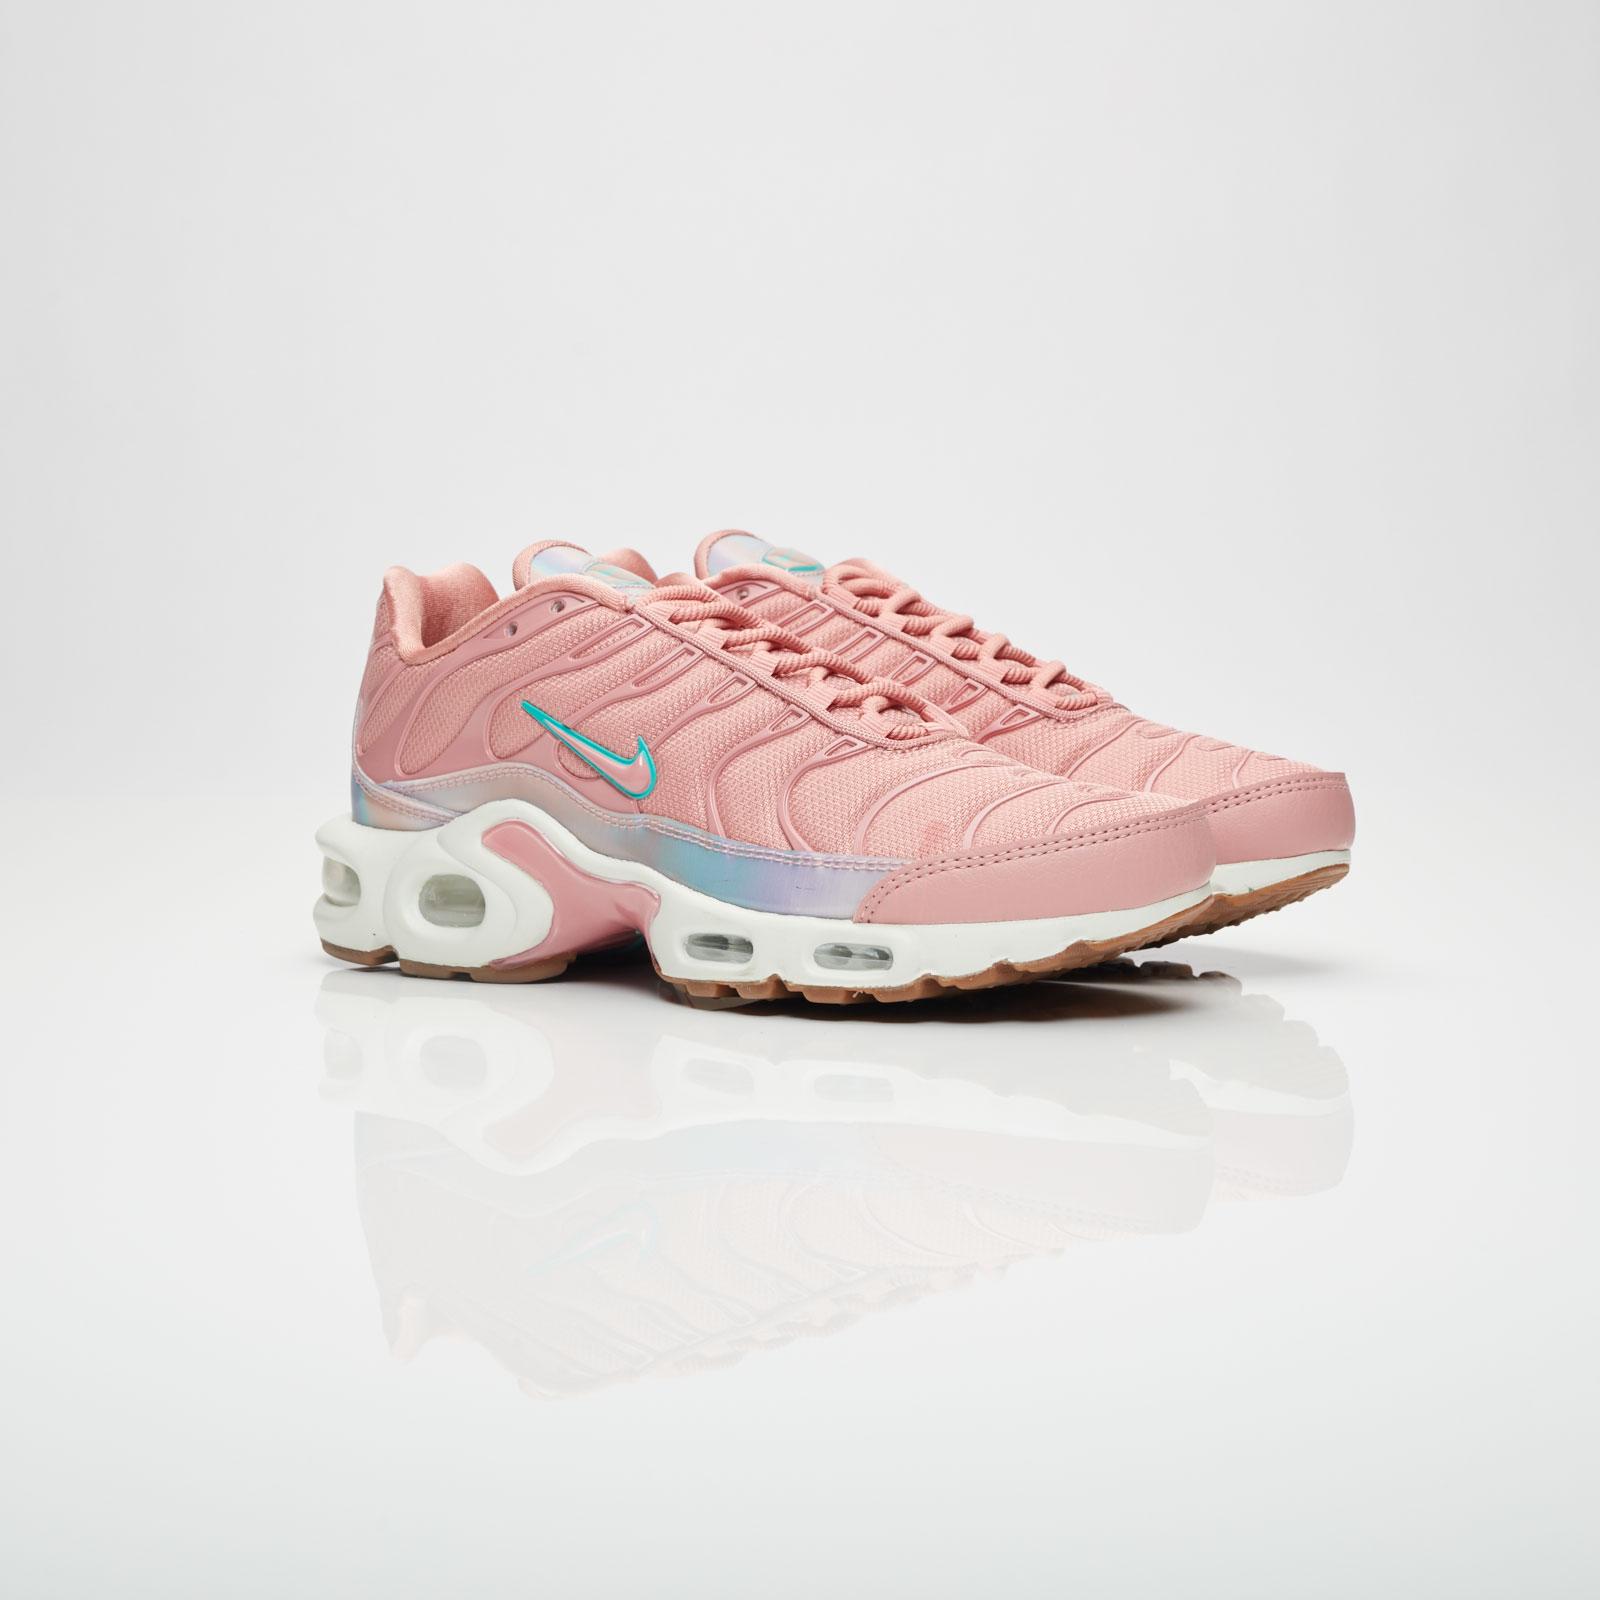 separation shoes f7ce2 33269 Nike Wmns Air Max Plus Se - 862201-600 - Sneakersnstuff ...